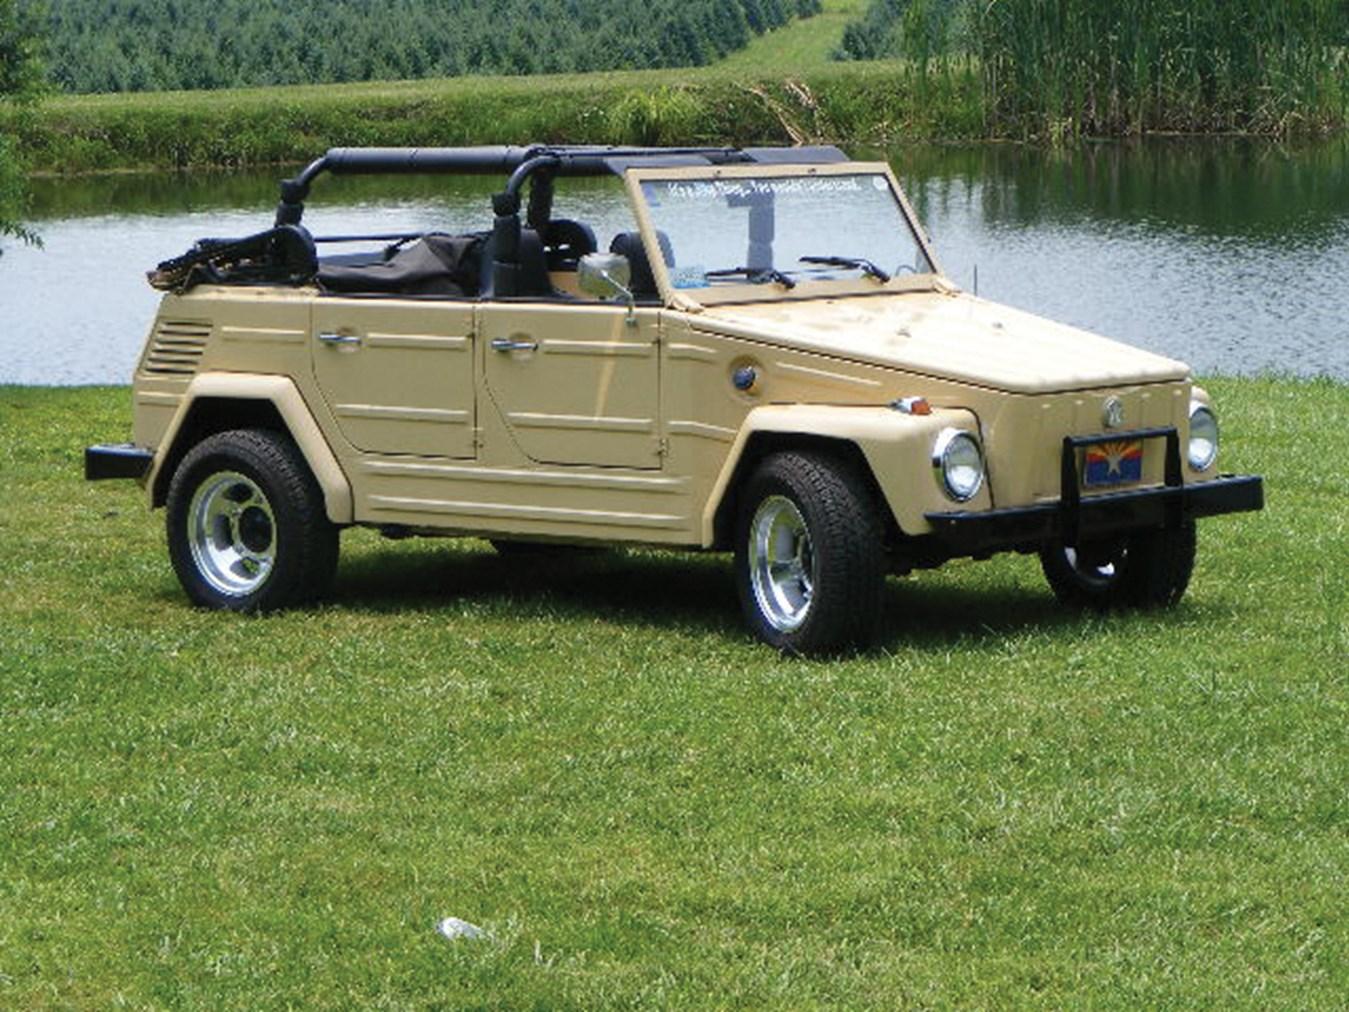 Rm sothebys 1971 volkswagen type 181 safari thing fall 1971 volkswagen type 181 safari thing altavistaventures Choice Image